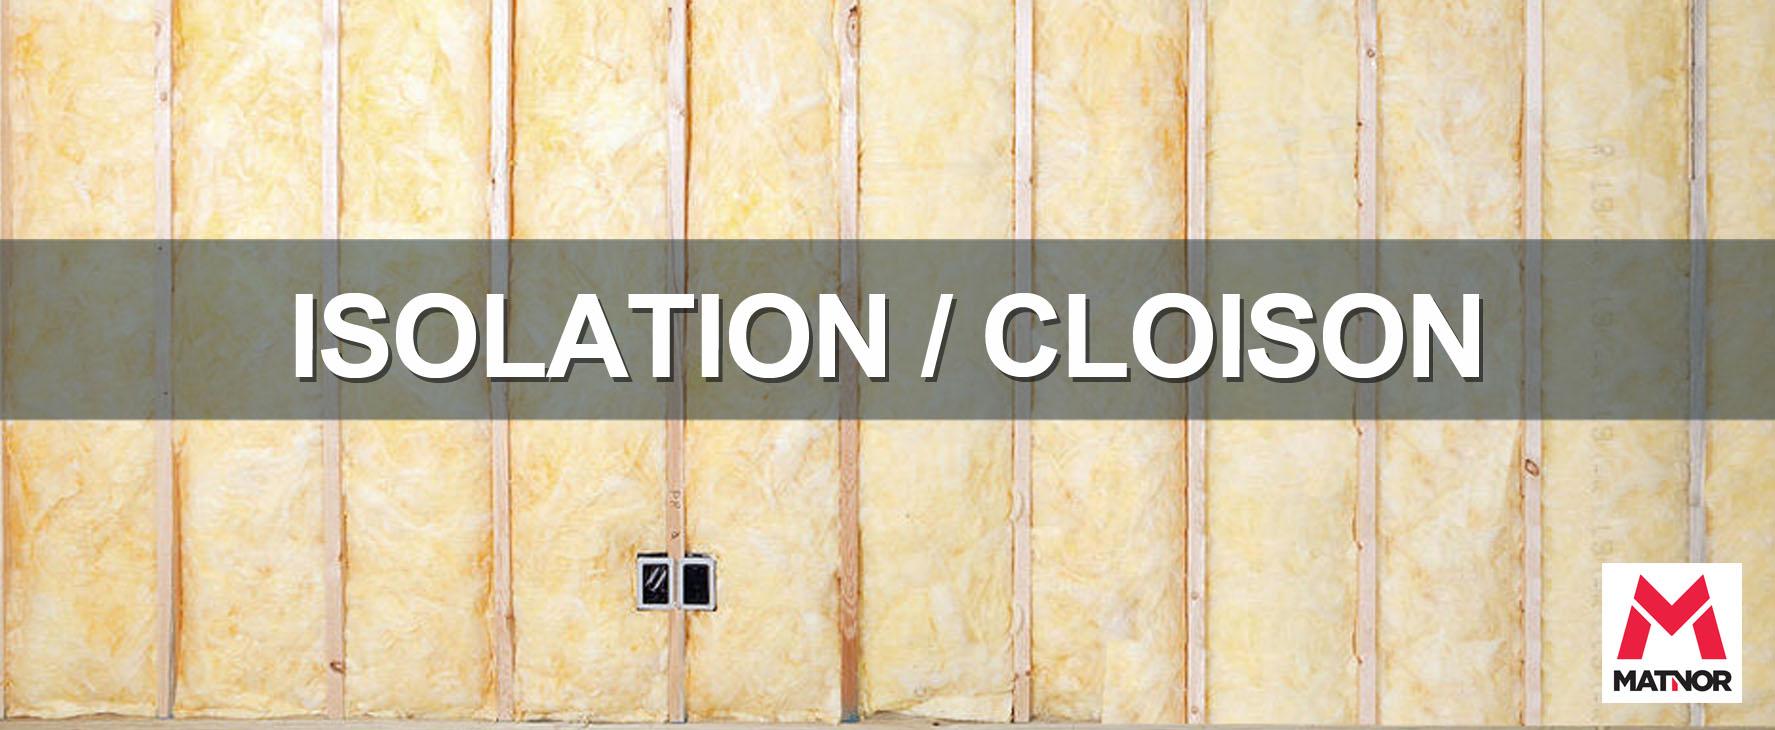 Bandeau isolation cloison